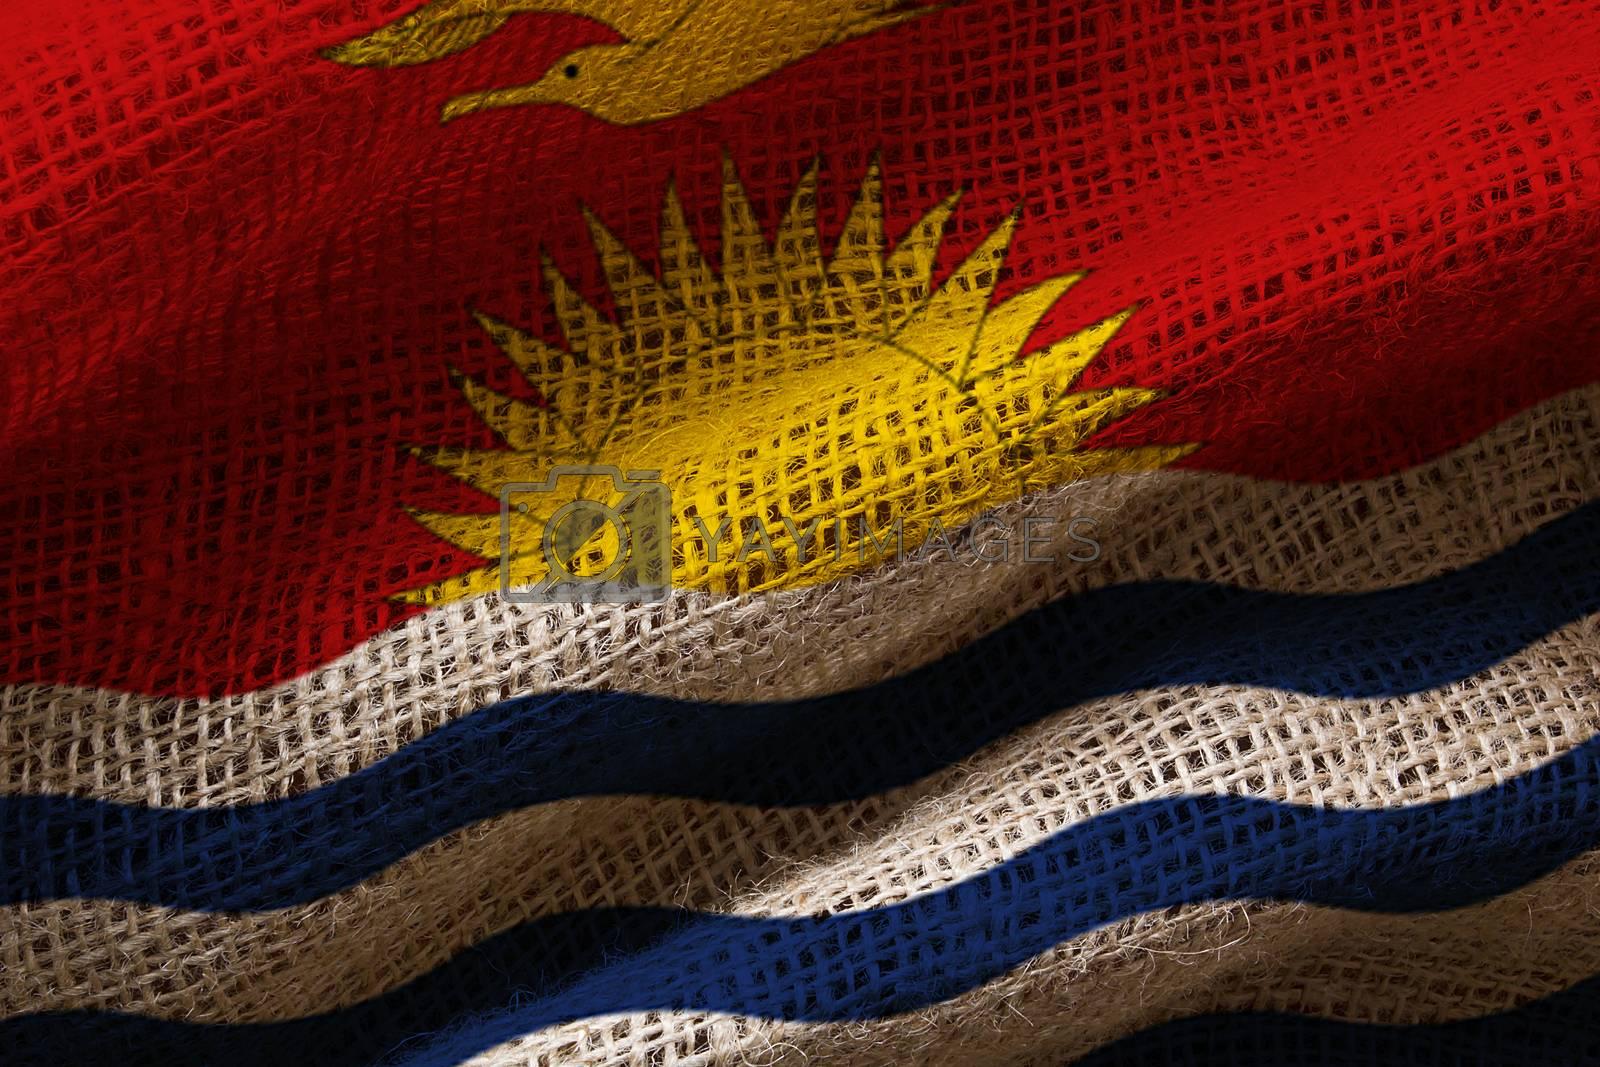 Close-up photograph of the flag of Kiribati